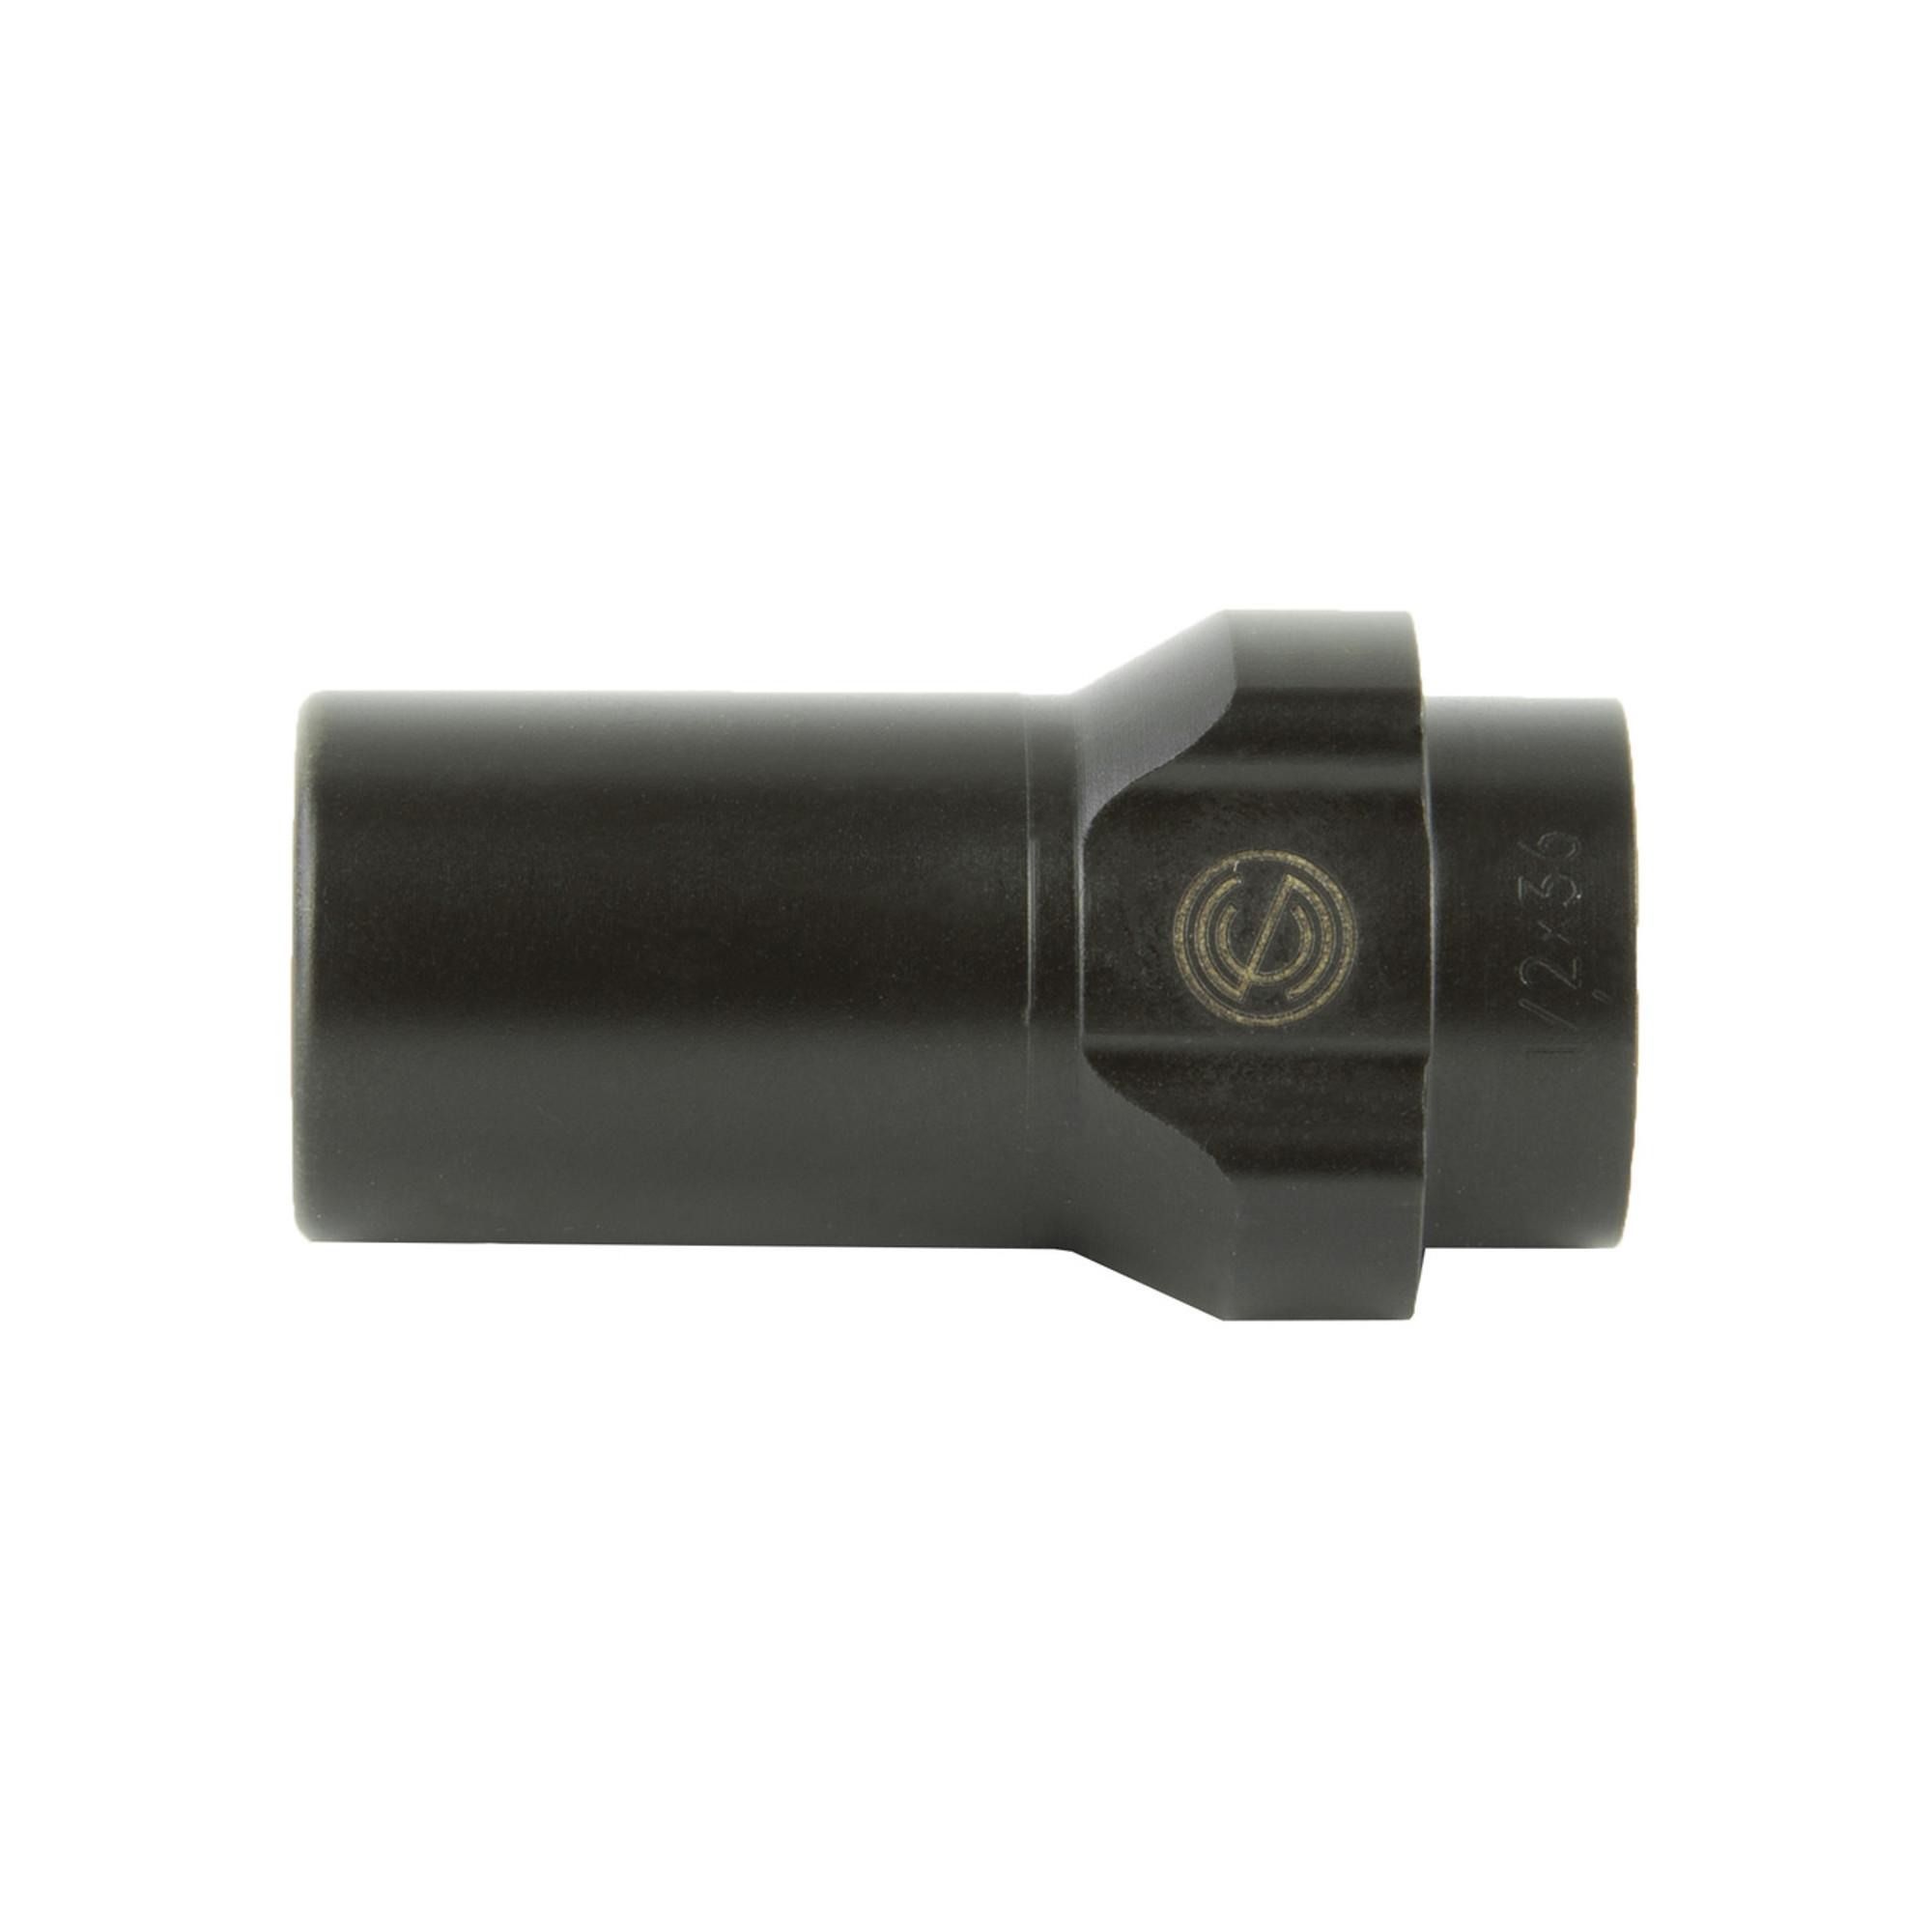 Sco 3lug Muzzle Device 9mm 1/2x36